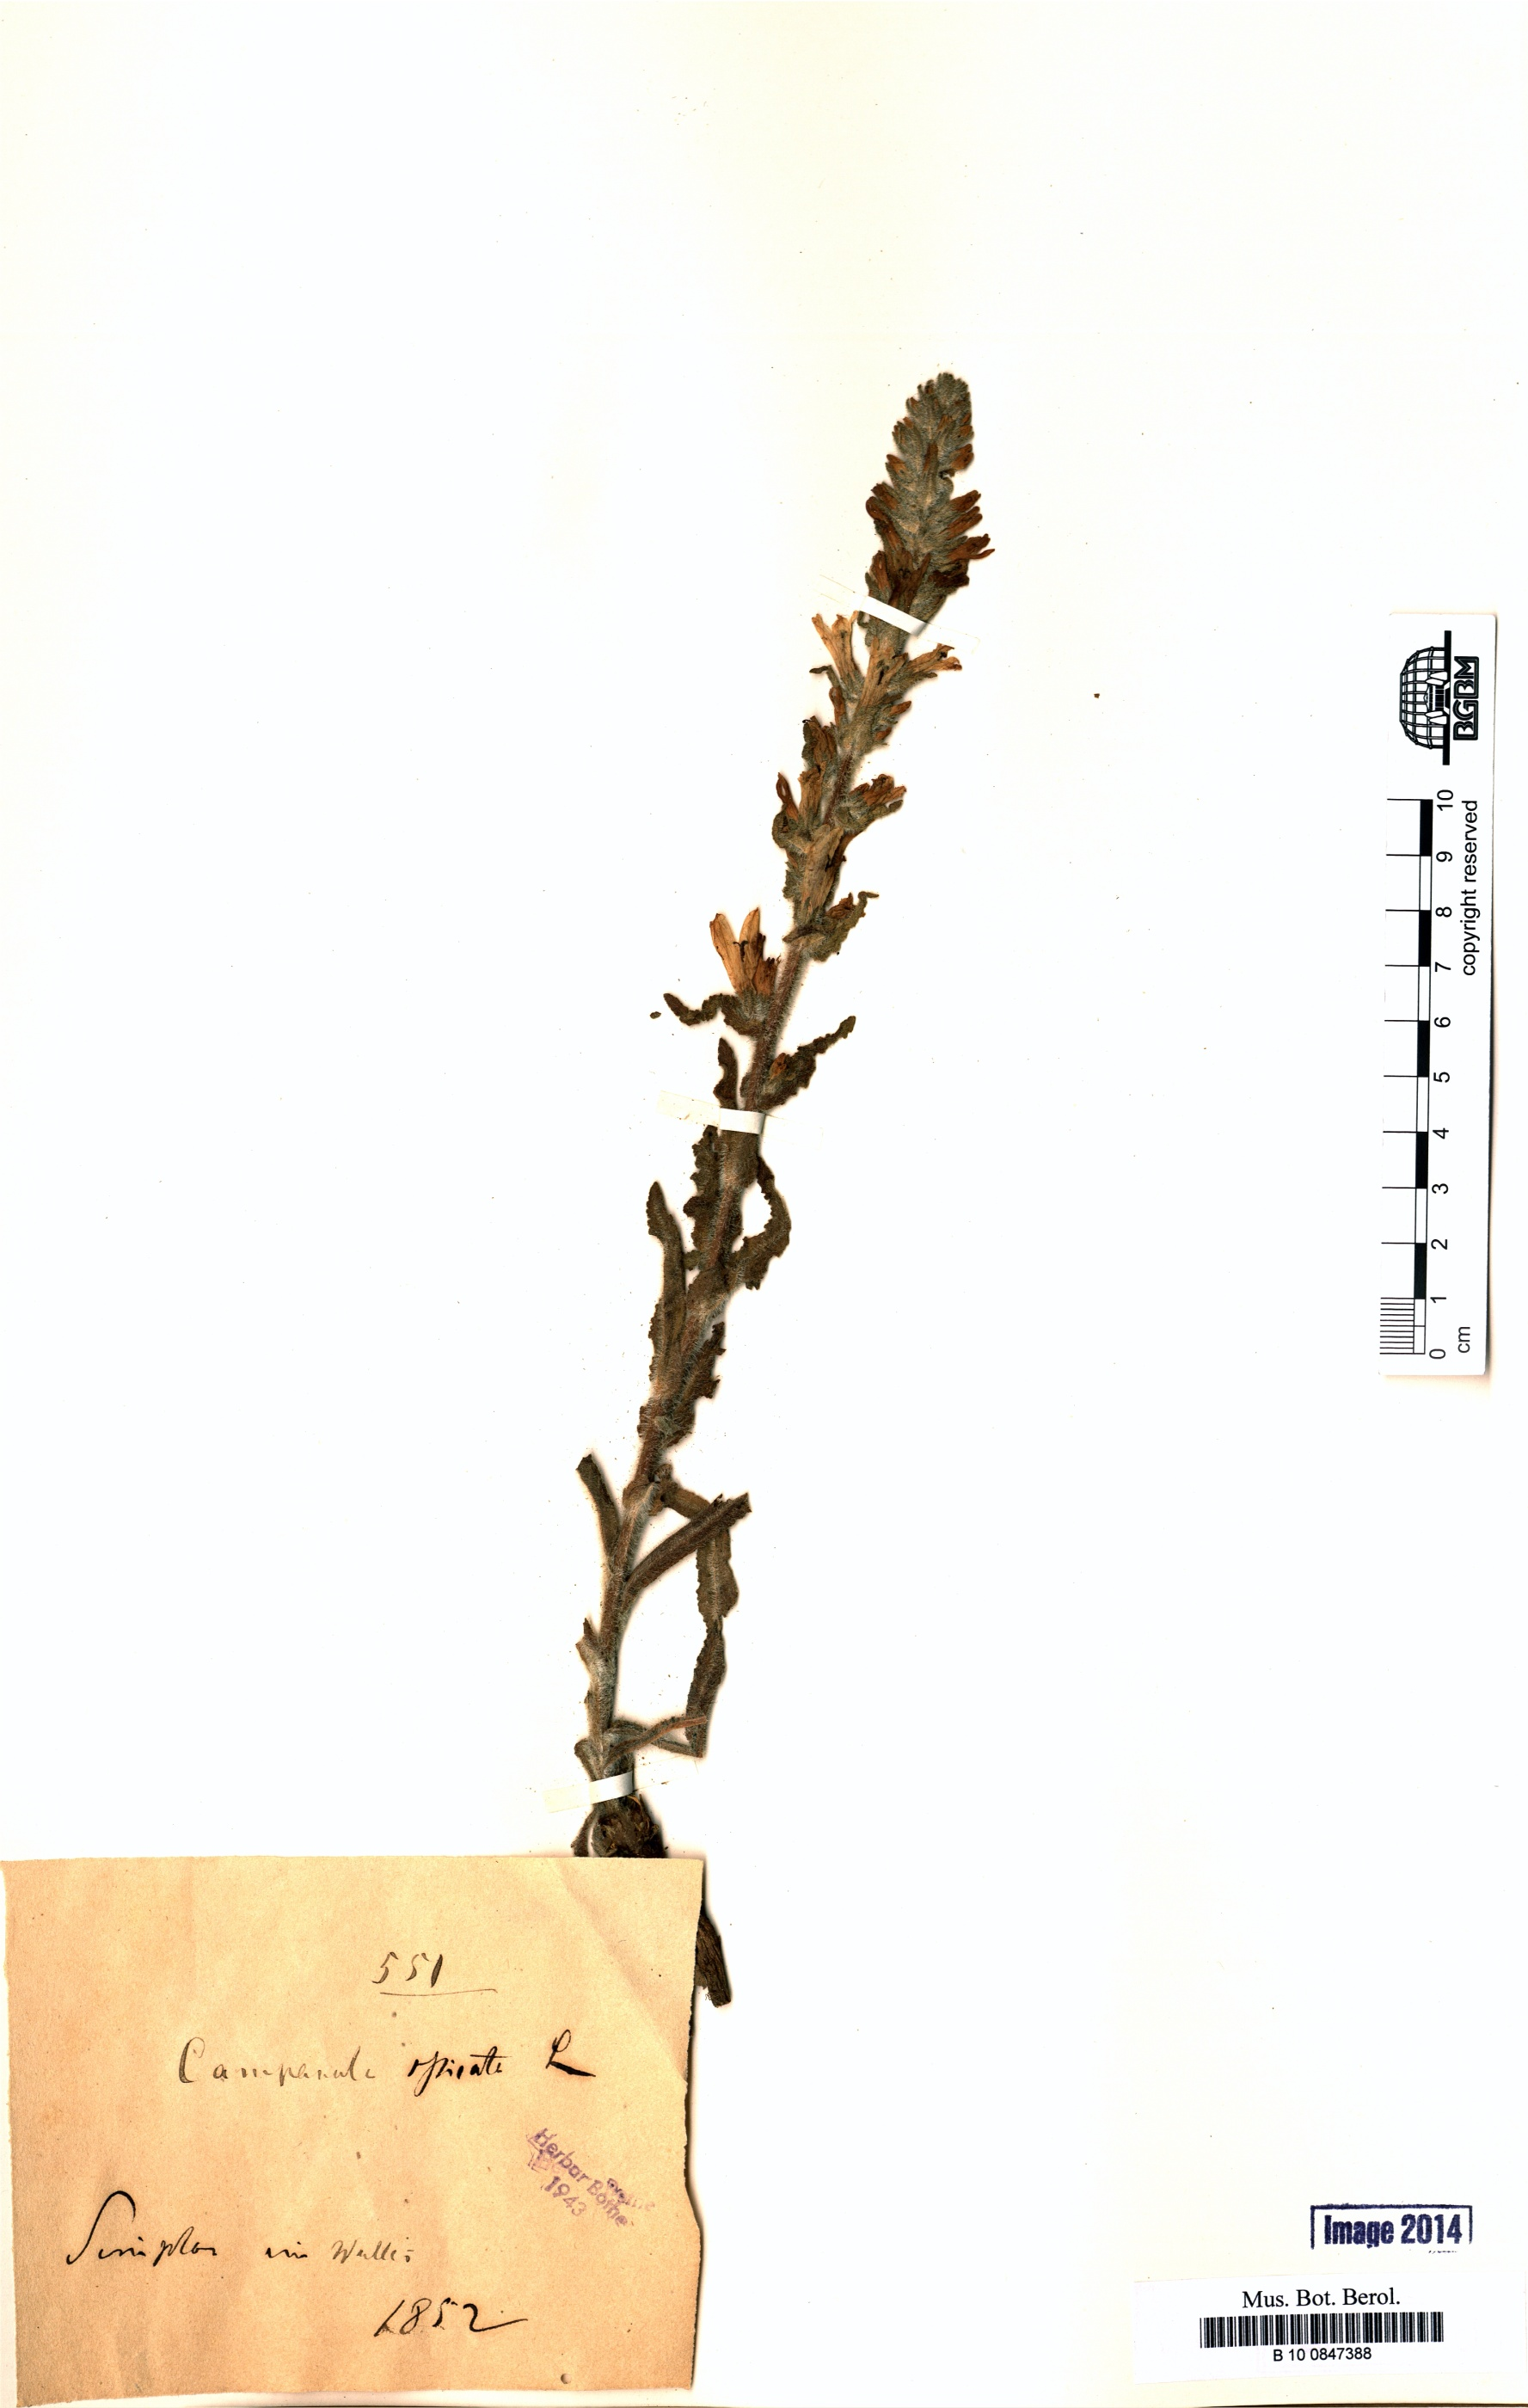 http://ww2.bgbm.org/herbarium/images/B/10/08/47/38/B_10_0847388.jpg